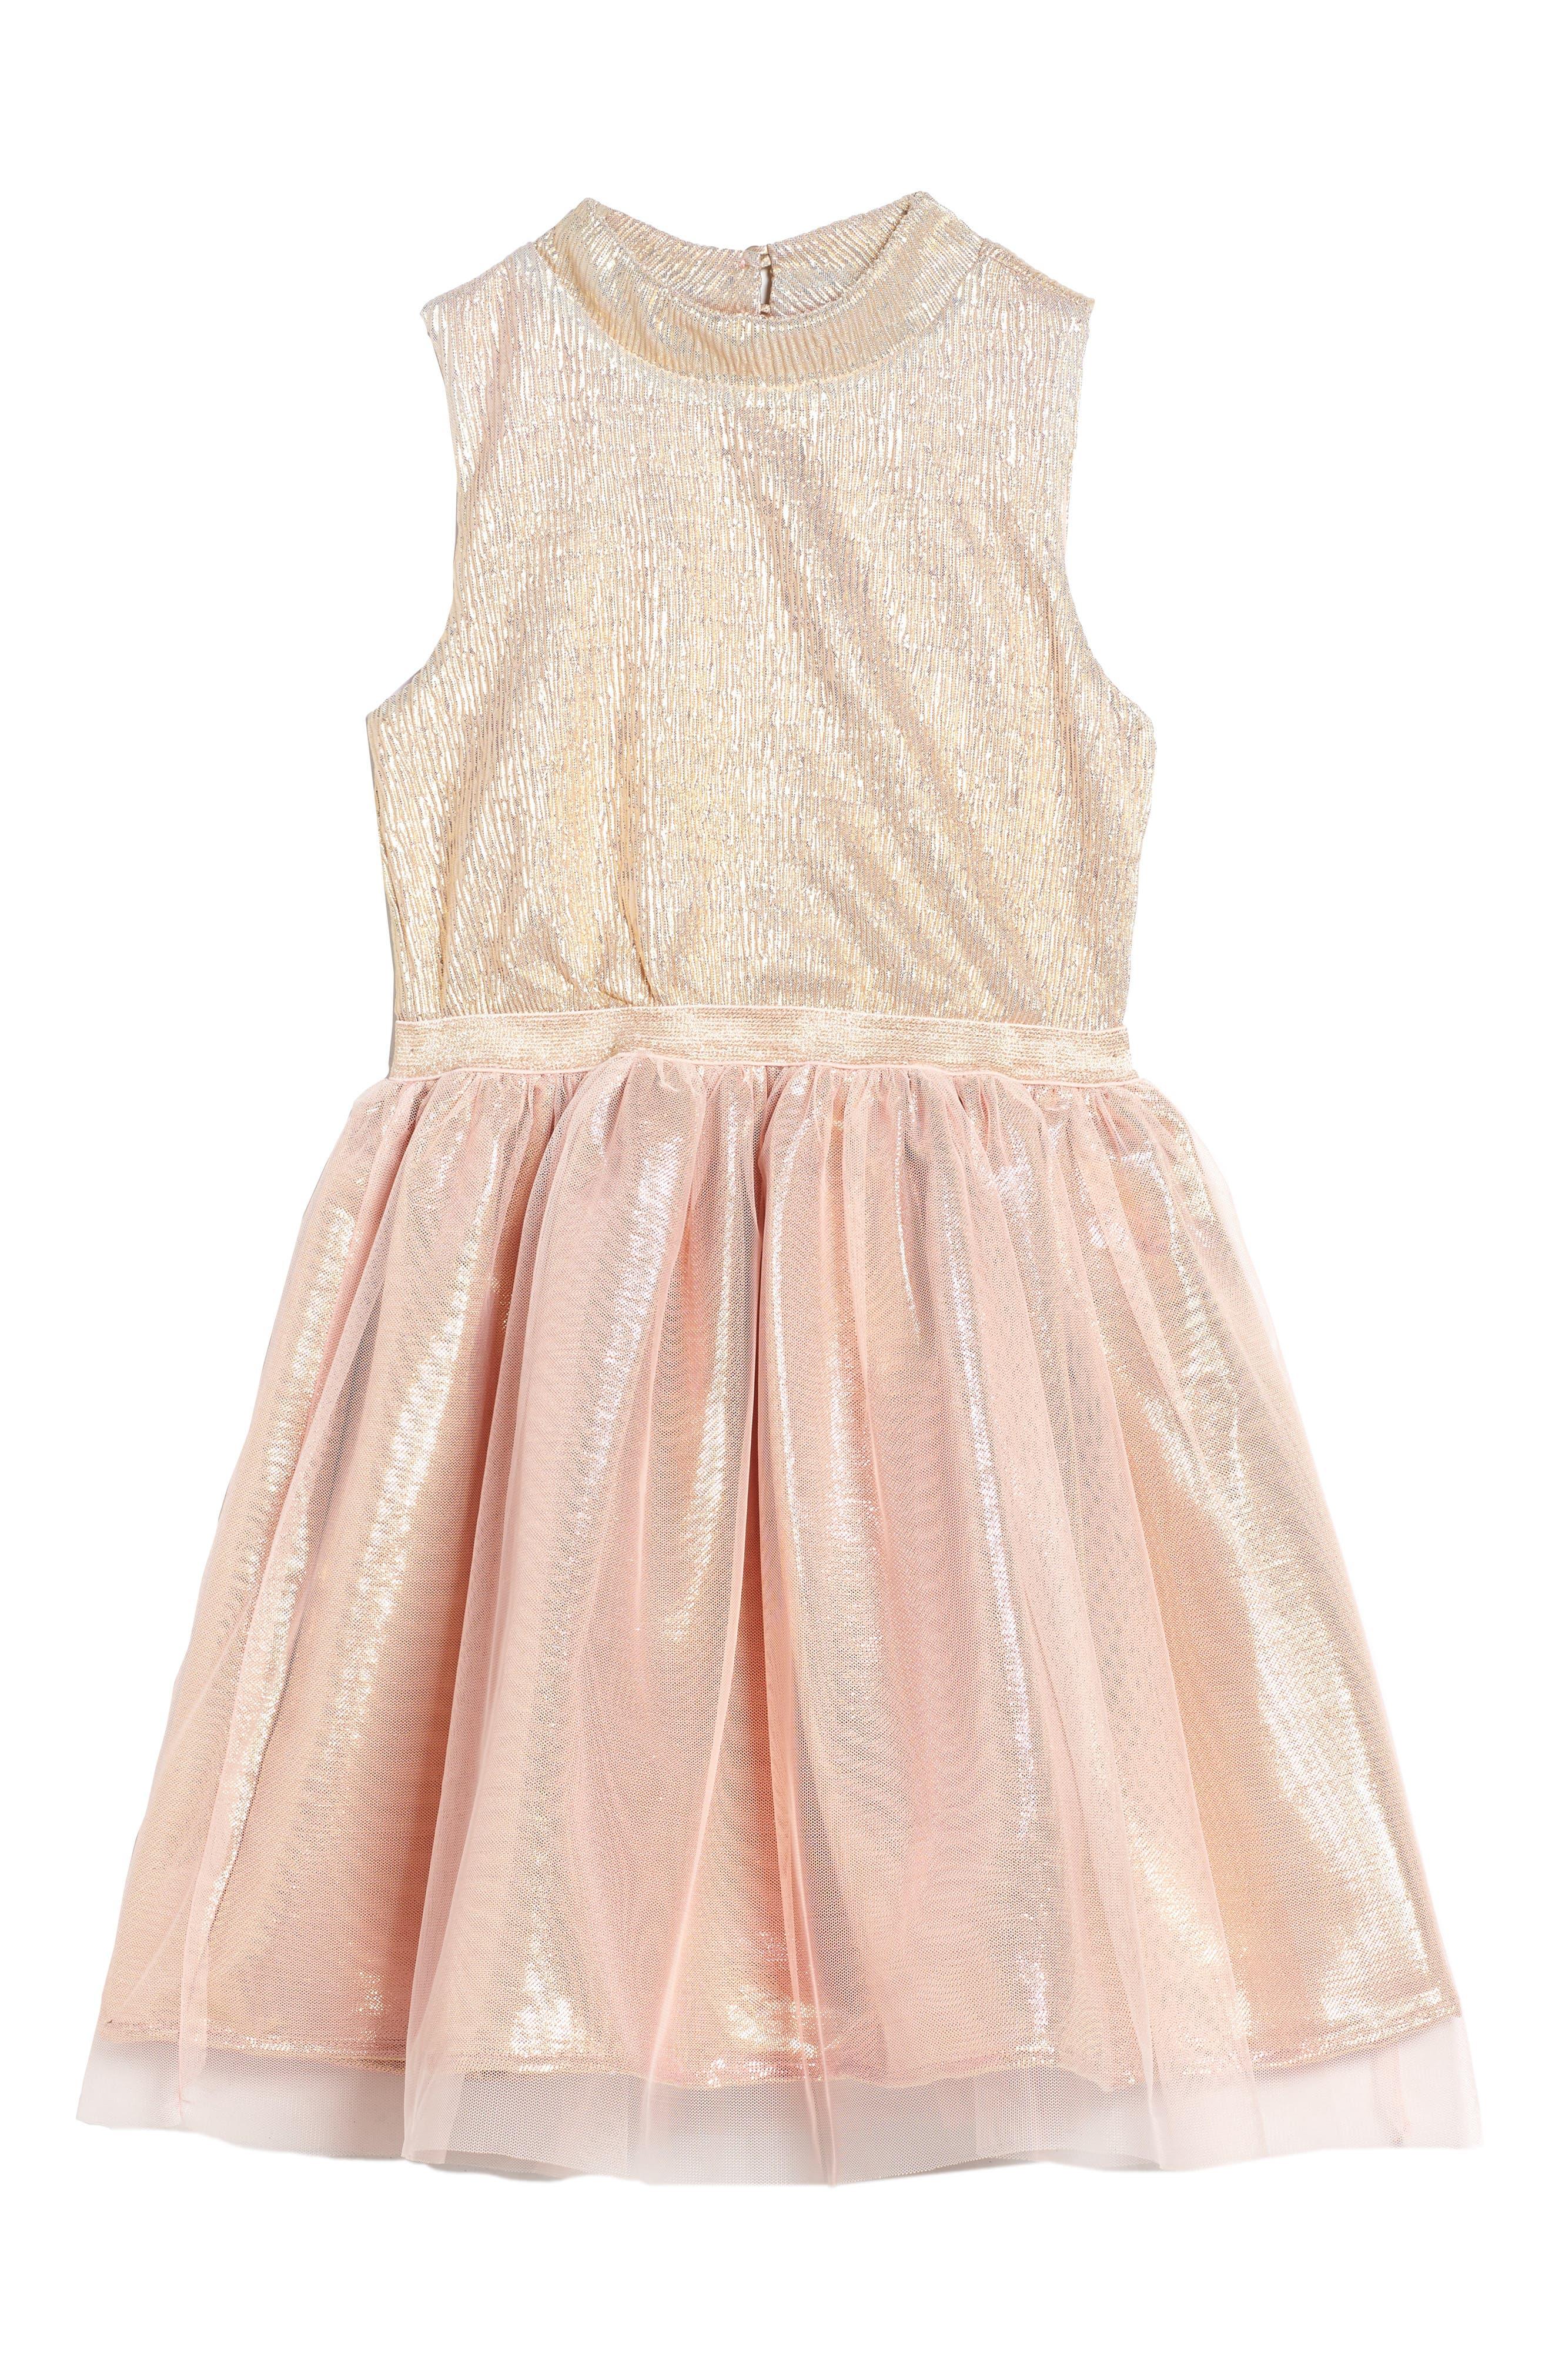 Alternate Image 1 Selected - Zunie Metallic Shimmer Mock Neck Dress (Big Girls)